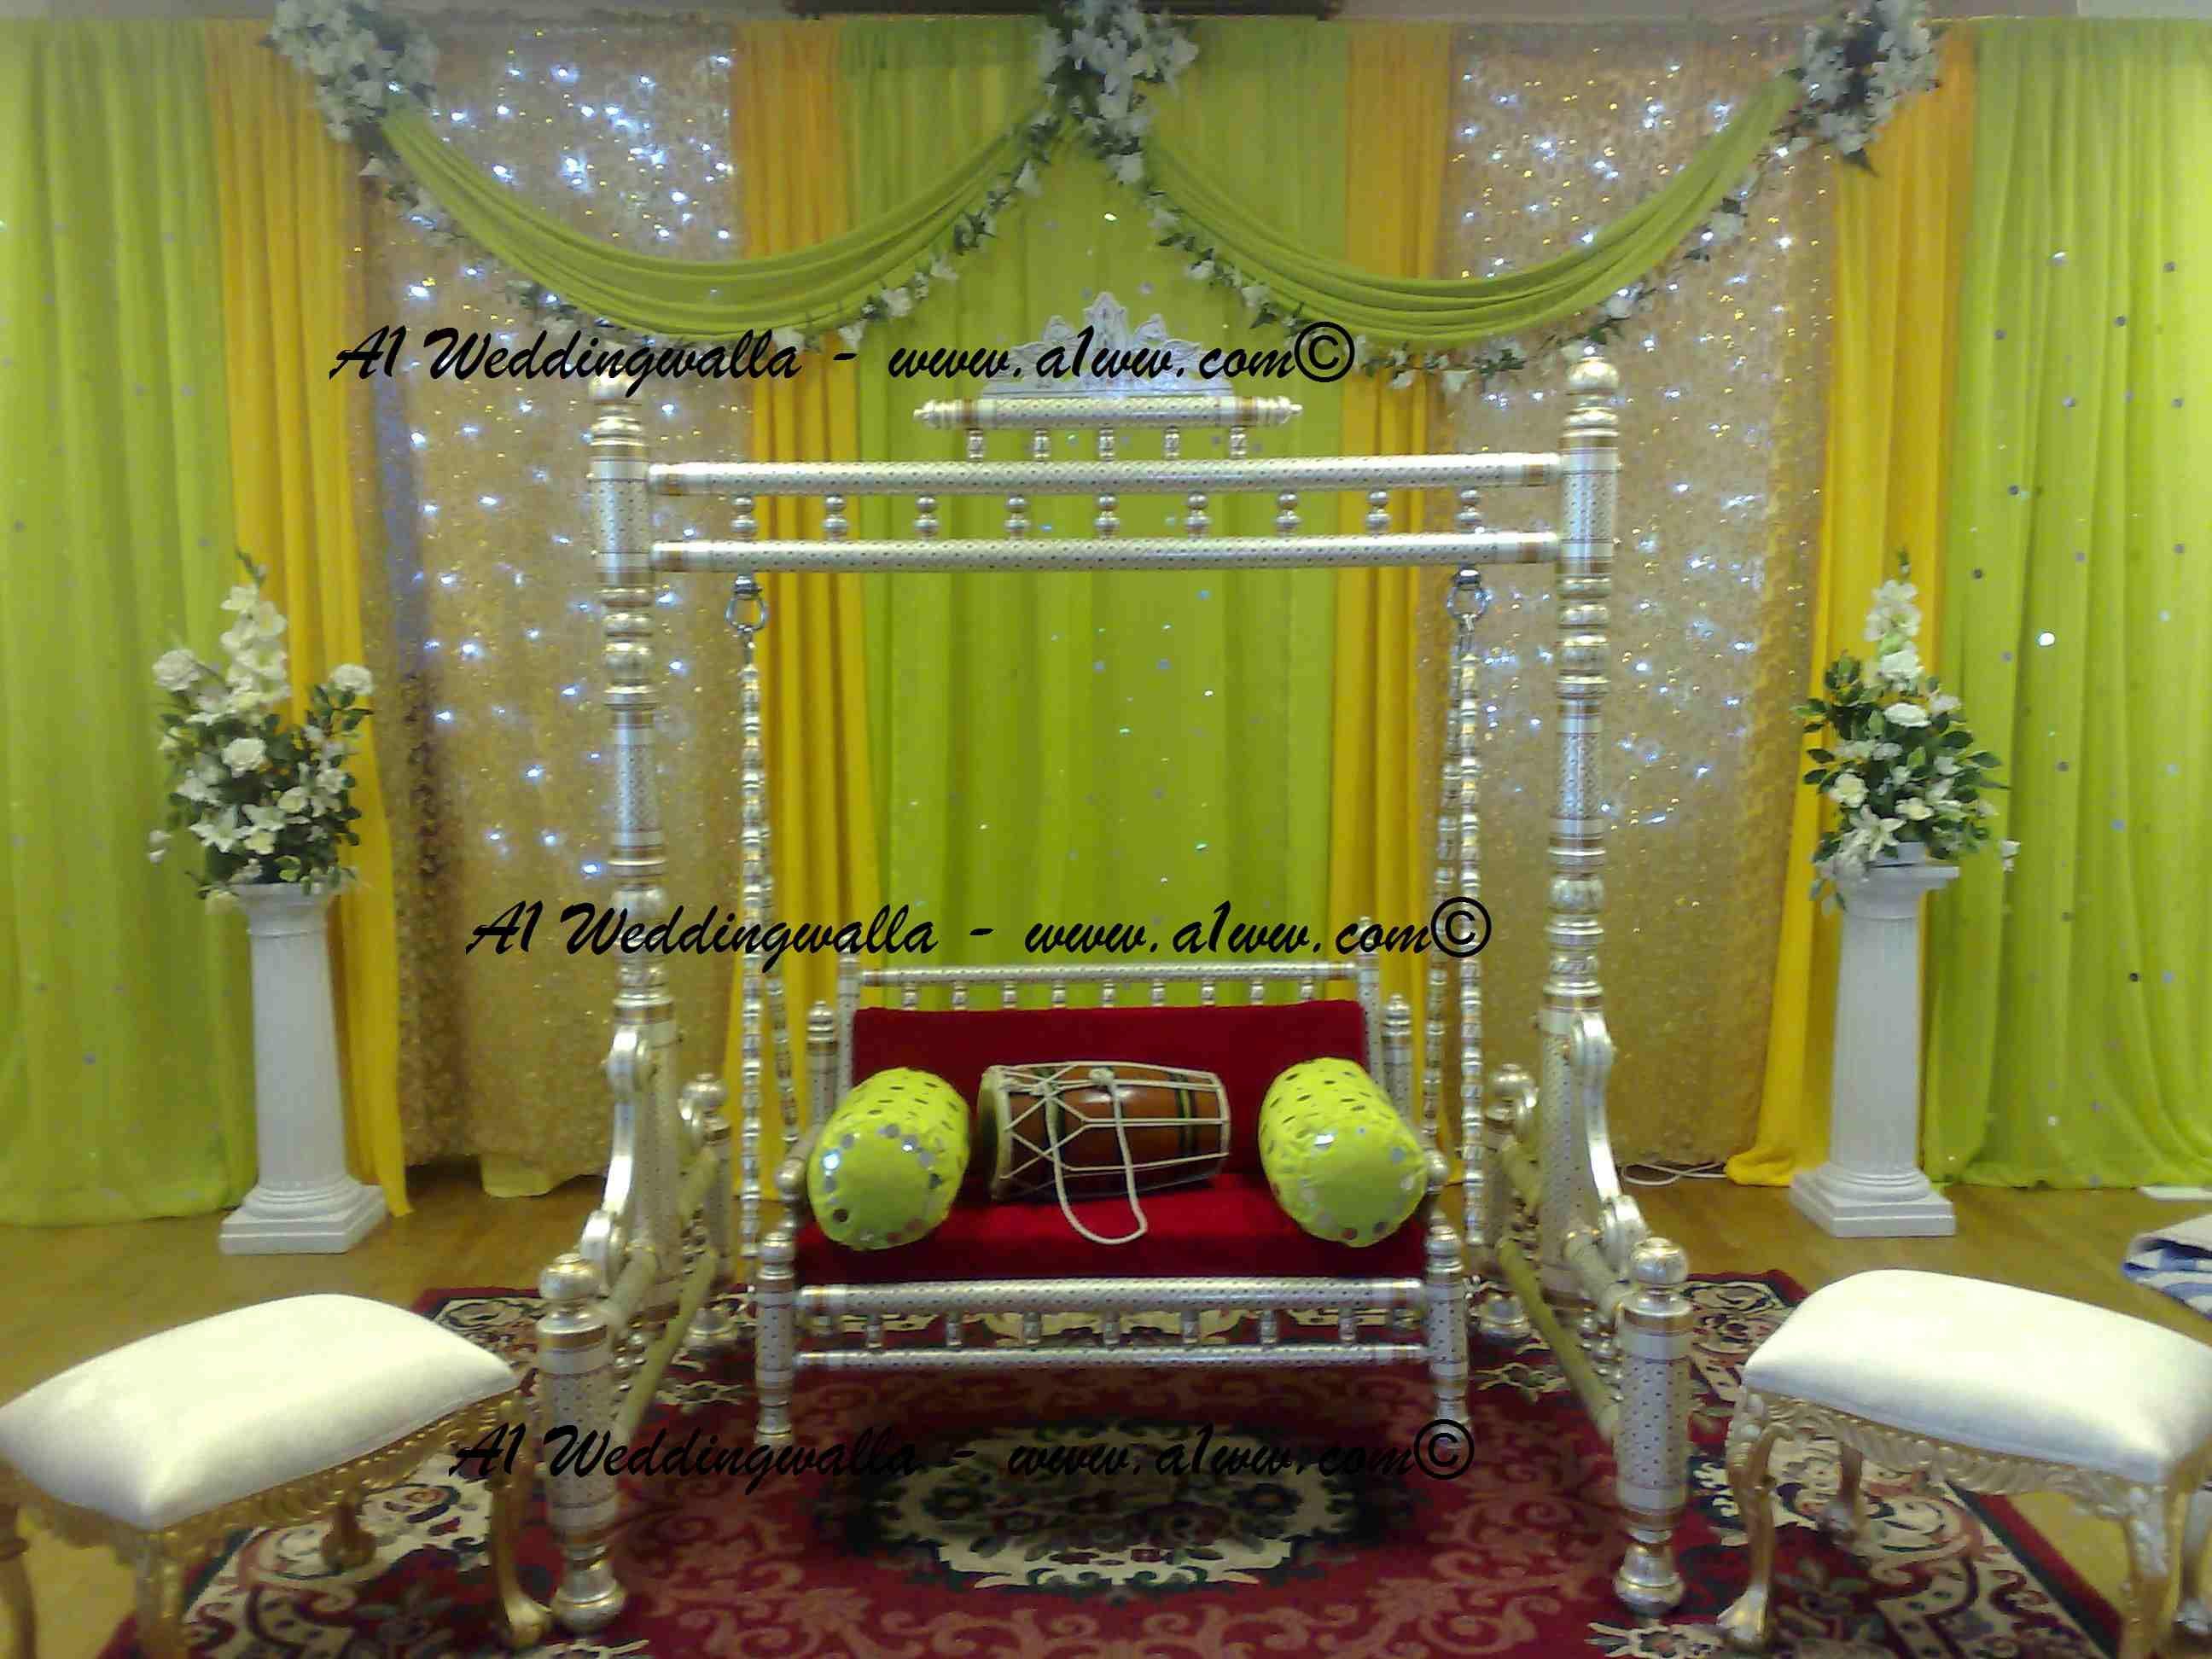 Indian wedding bedroom decoration ideas - Wedding Decoration Jw Design Wedding Decoration Grand Imperial Restaurant Klang